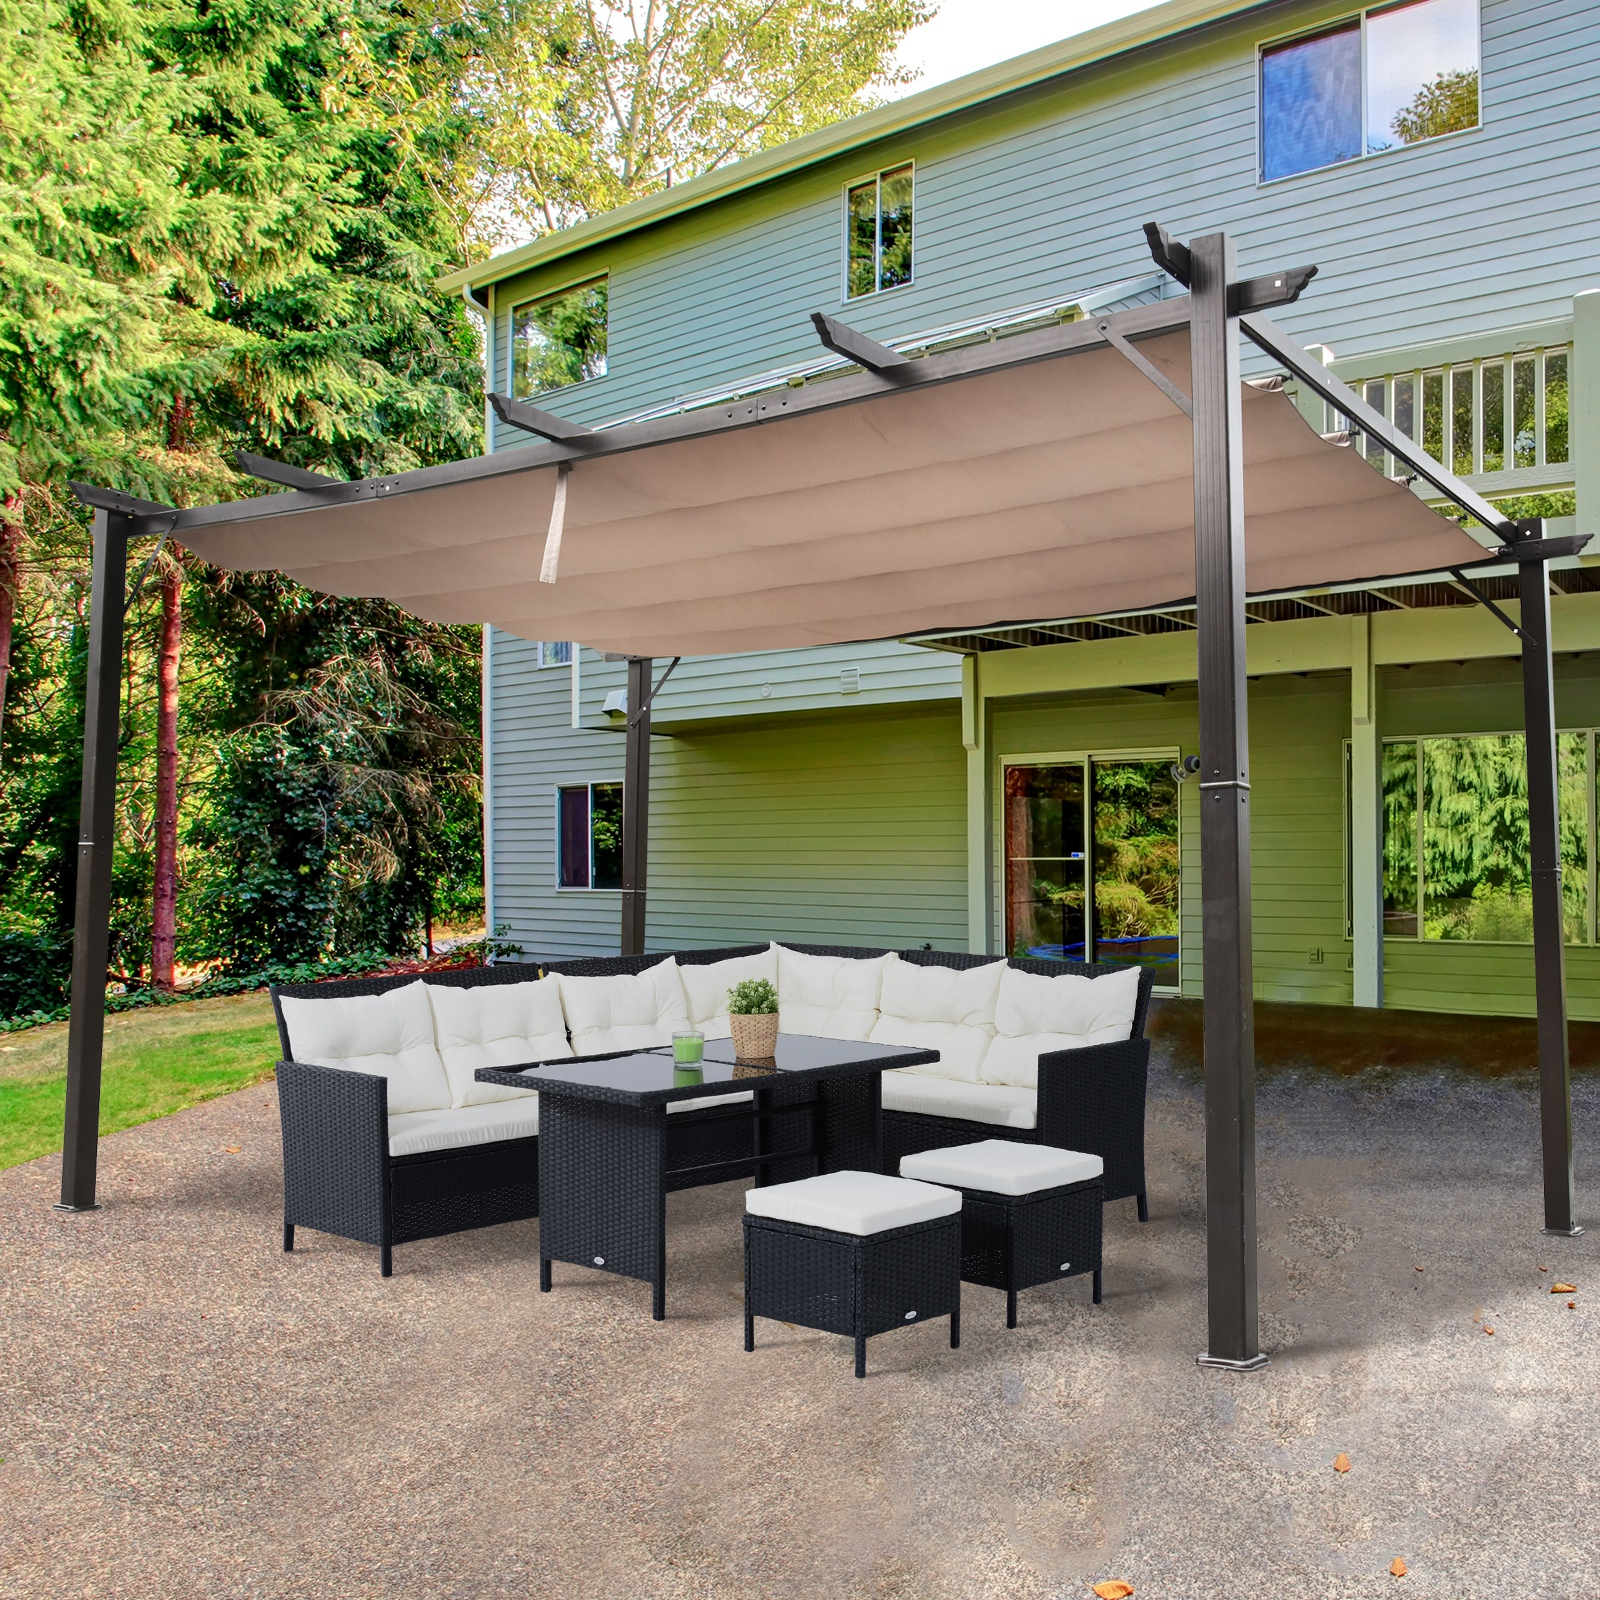 Gardens High Density Polyethylene Deck Ultra-High Shade Grade Sunshade Panel Porch Screen for Patio Joyeyou 90/% Shade Cloth 10x10 Beige Pergola Cover 10FT x 10FT, Beige Outdoor